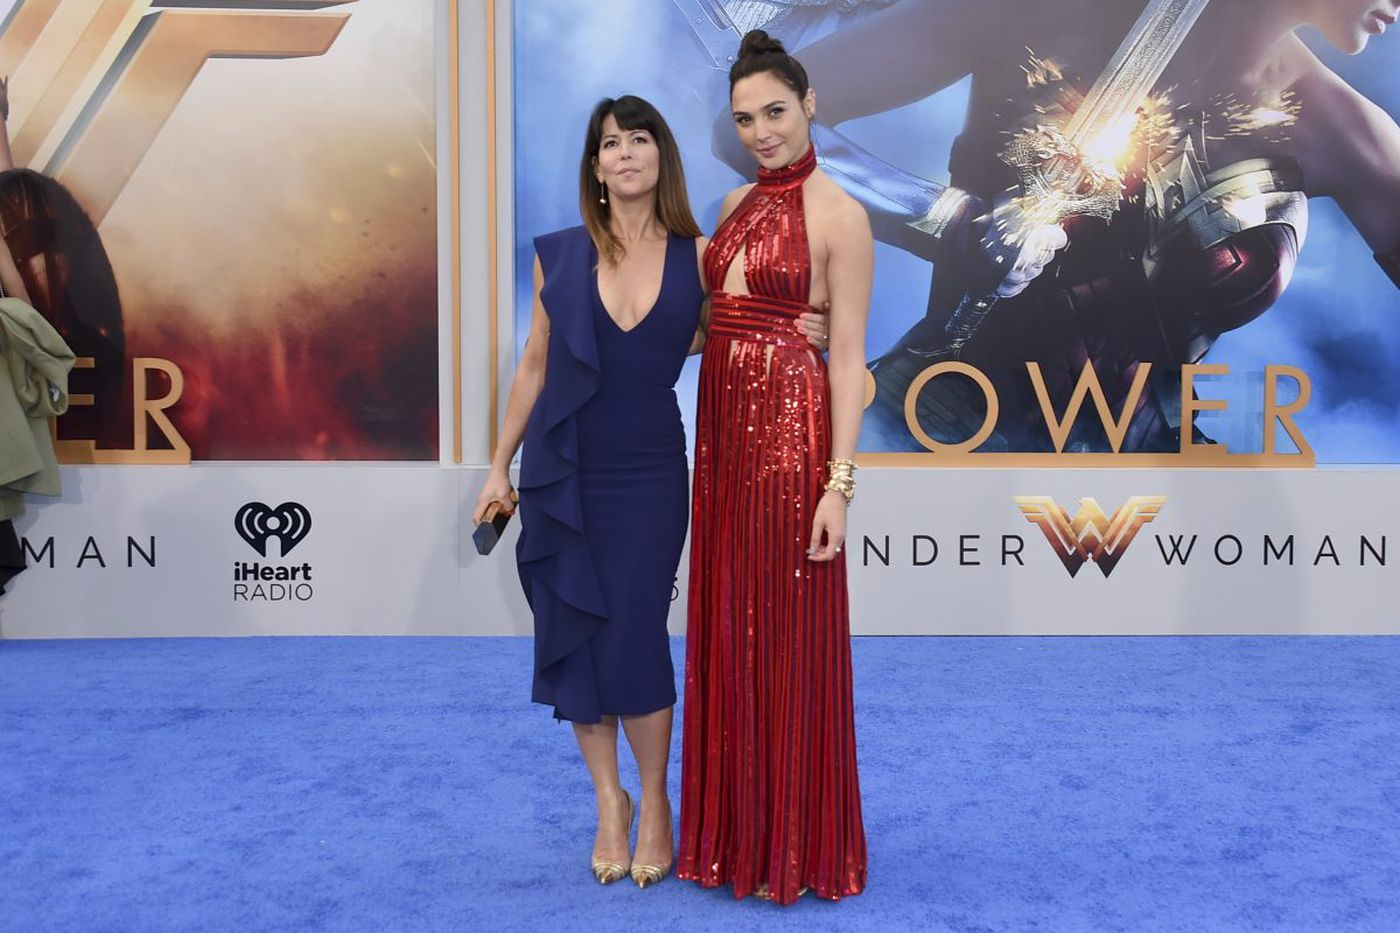 Two women team up to make 'Wonder Woman' soar